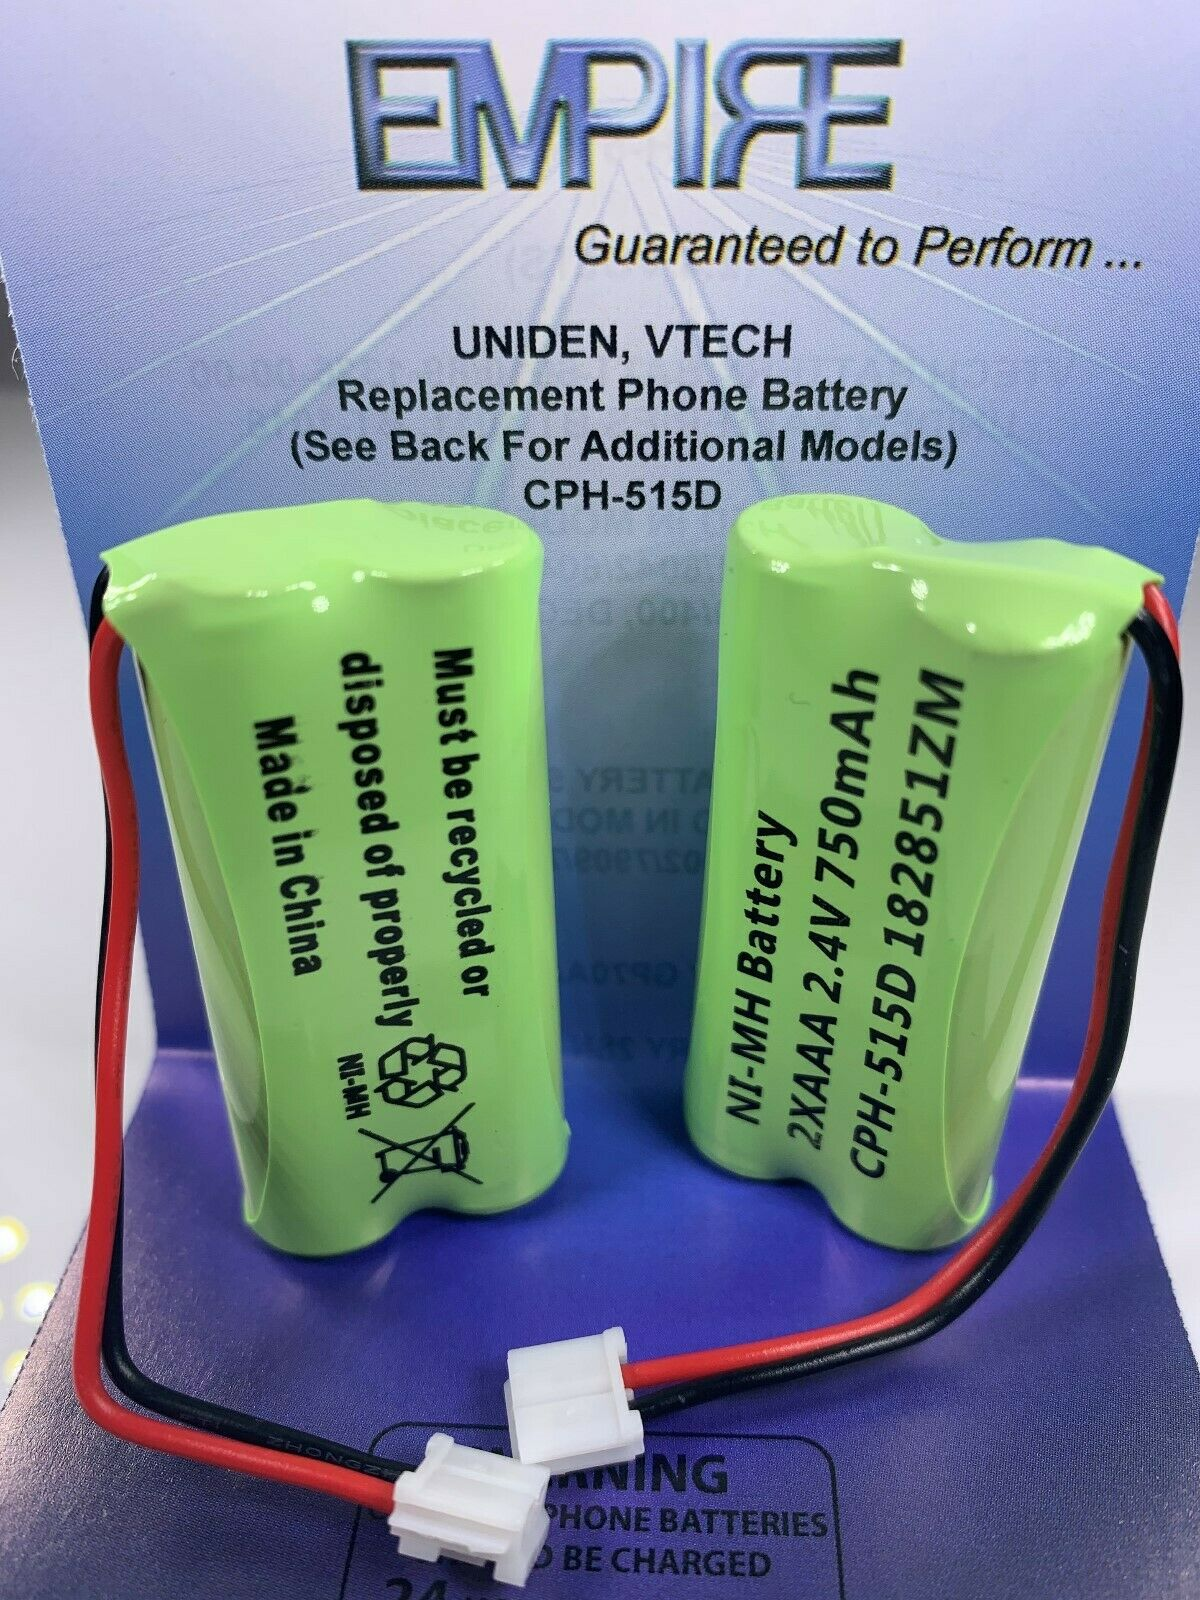 RCA VISYS 25252 2.4V 750mAh NiMH Empire Scientific Cordless Phone Battery 2 Pack